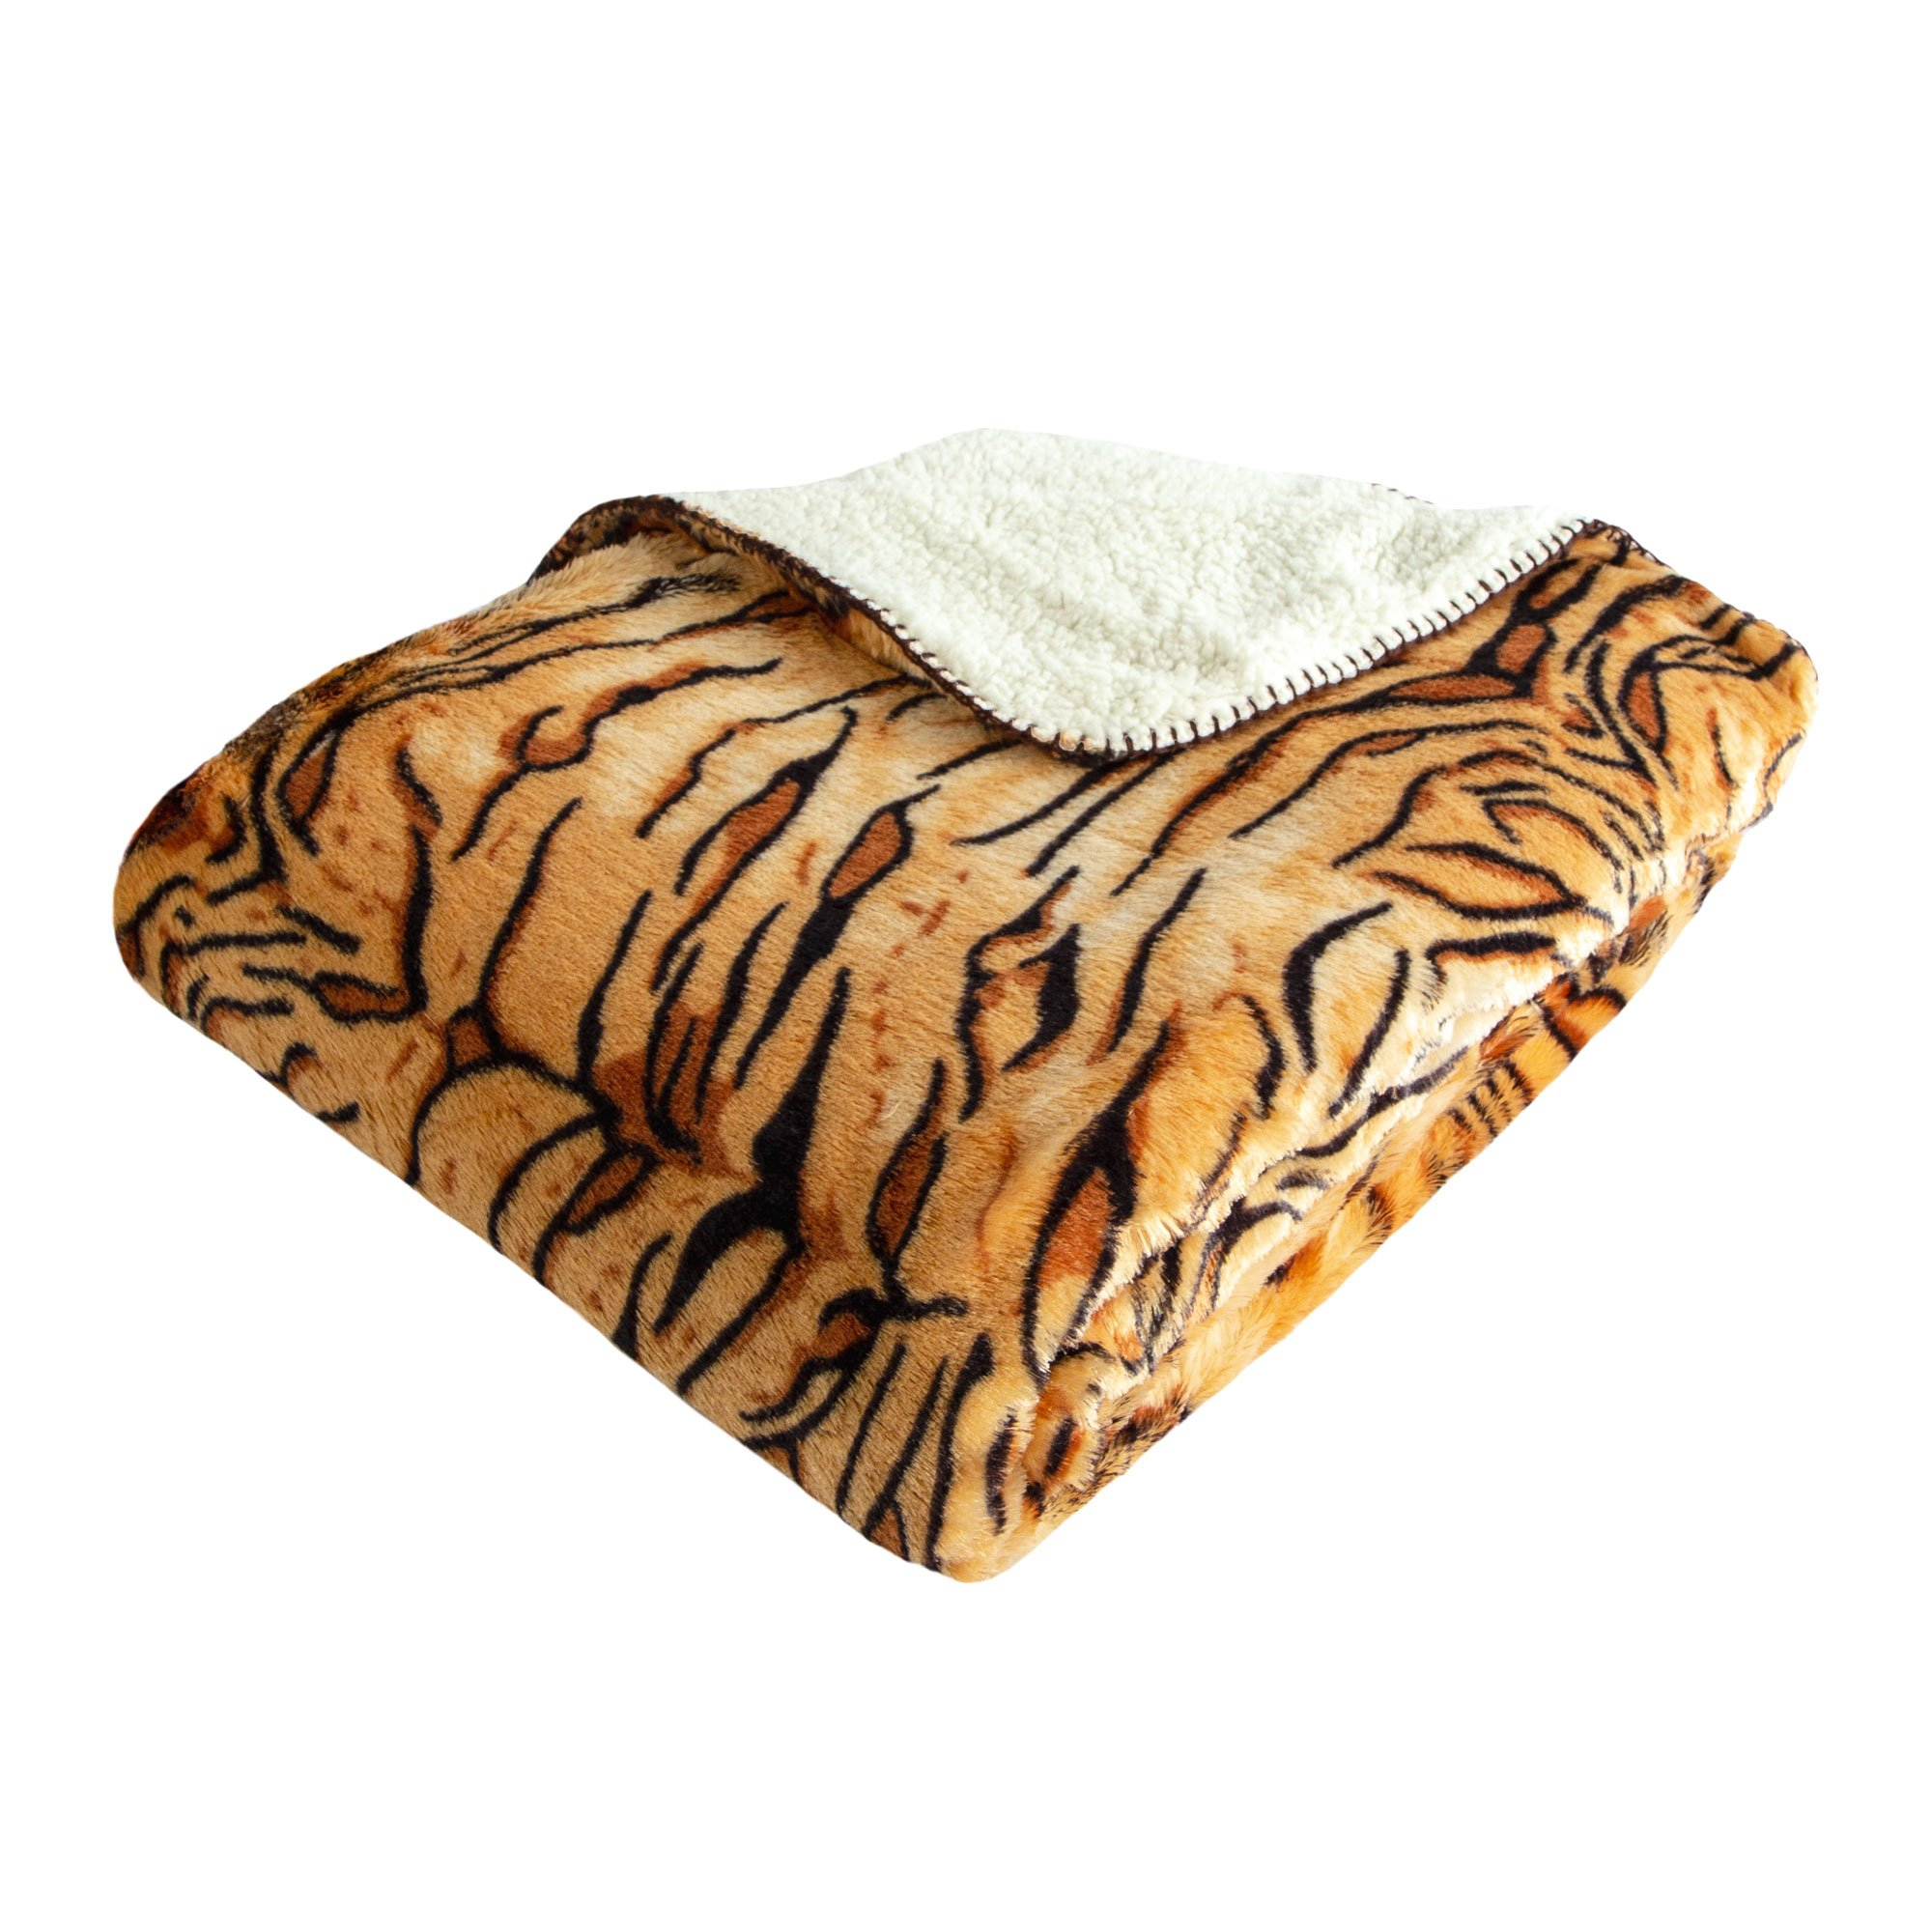 Cozy Fleece Oversized Luxury Mink Animal Print Throw with Sherpa Back, Tiger